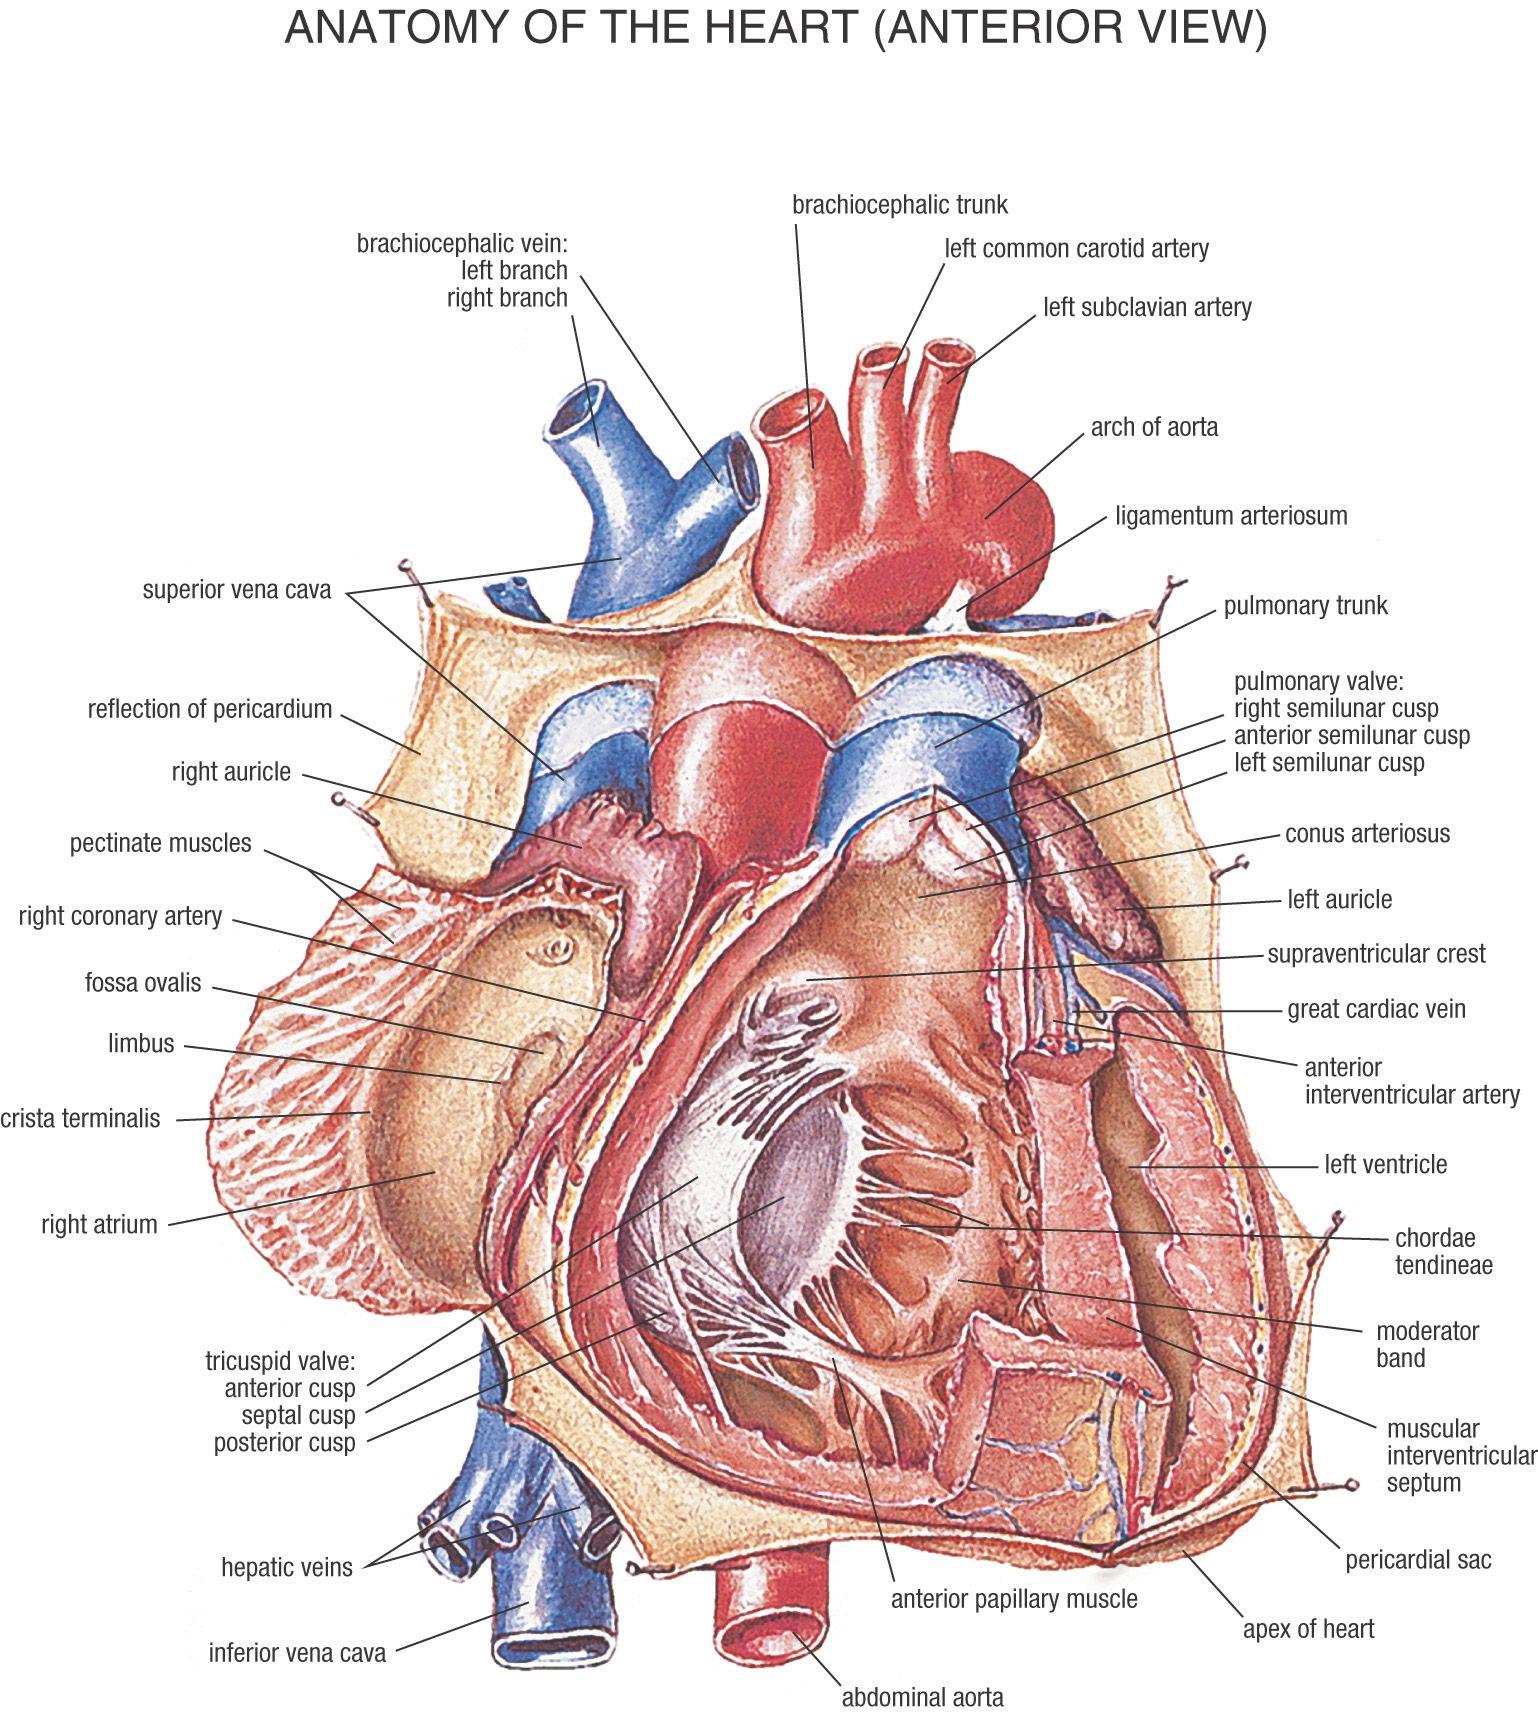 Heart anterior view | Anatomy | Pinterest | Anatomía, Anatomía ...